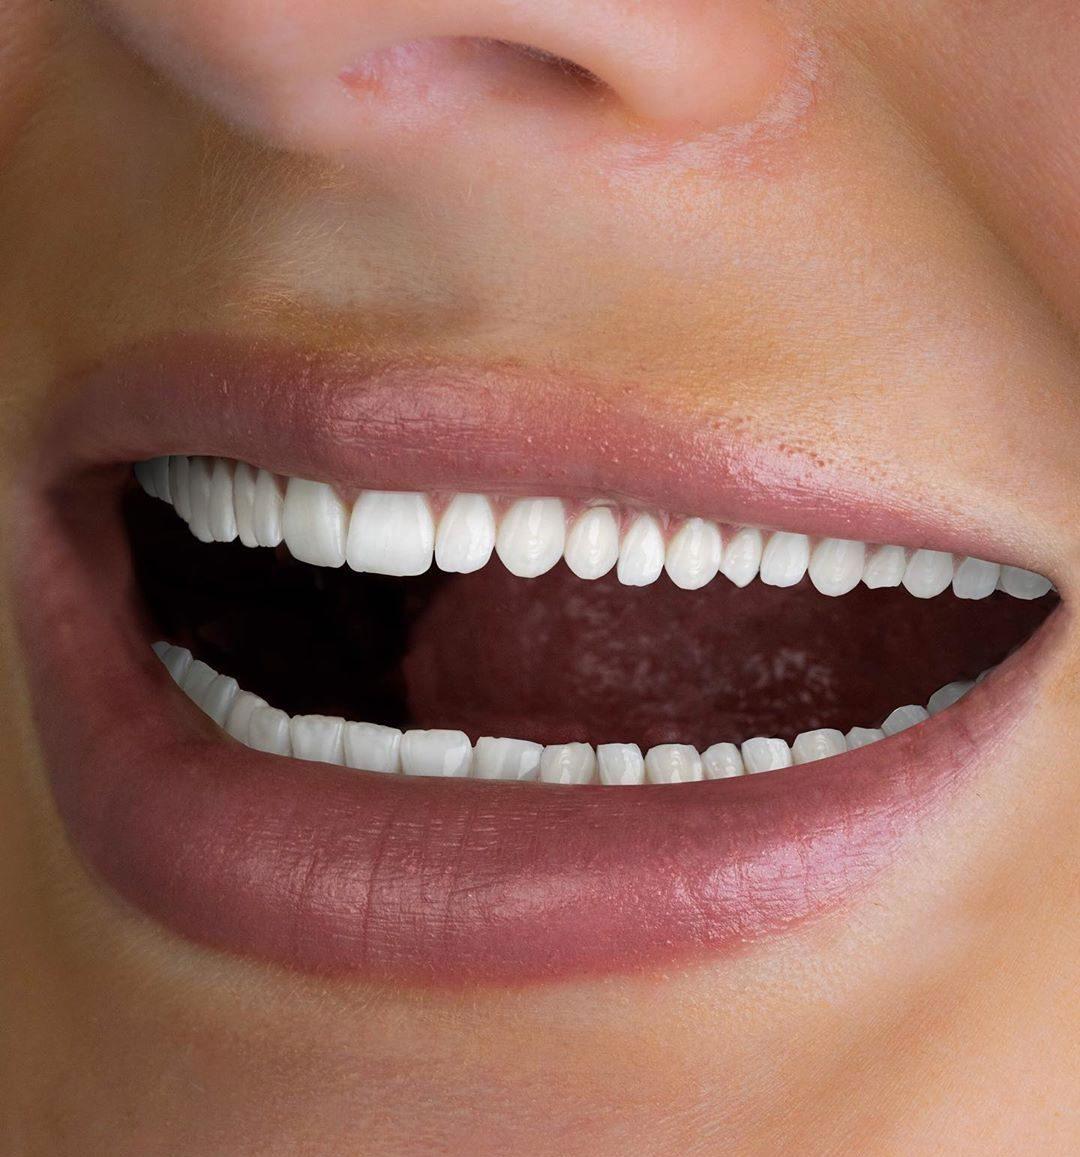 creepy tooth whitening advert